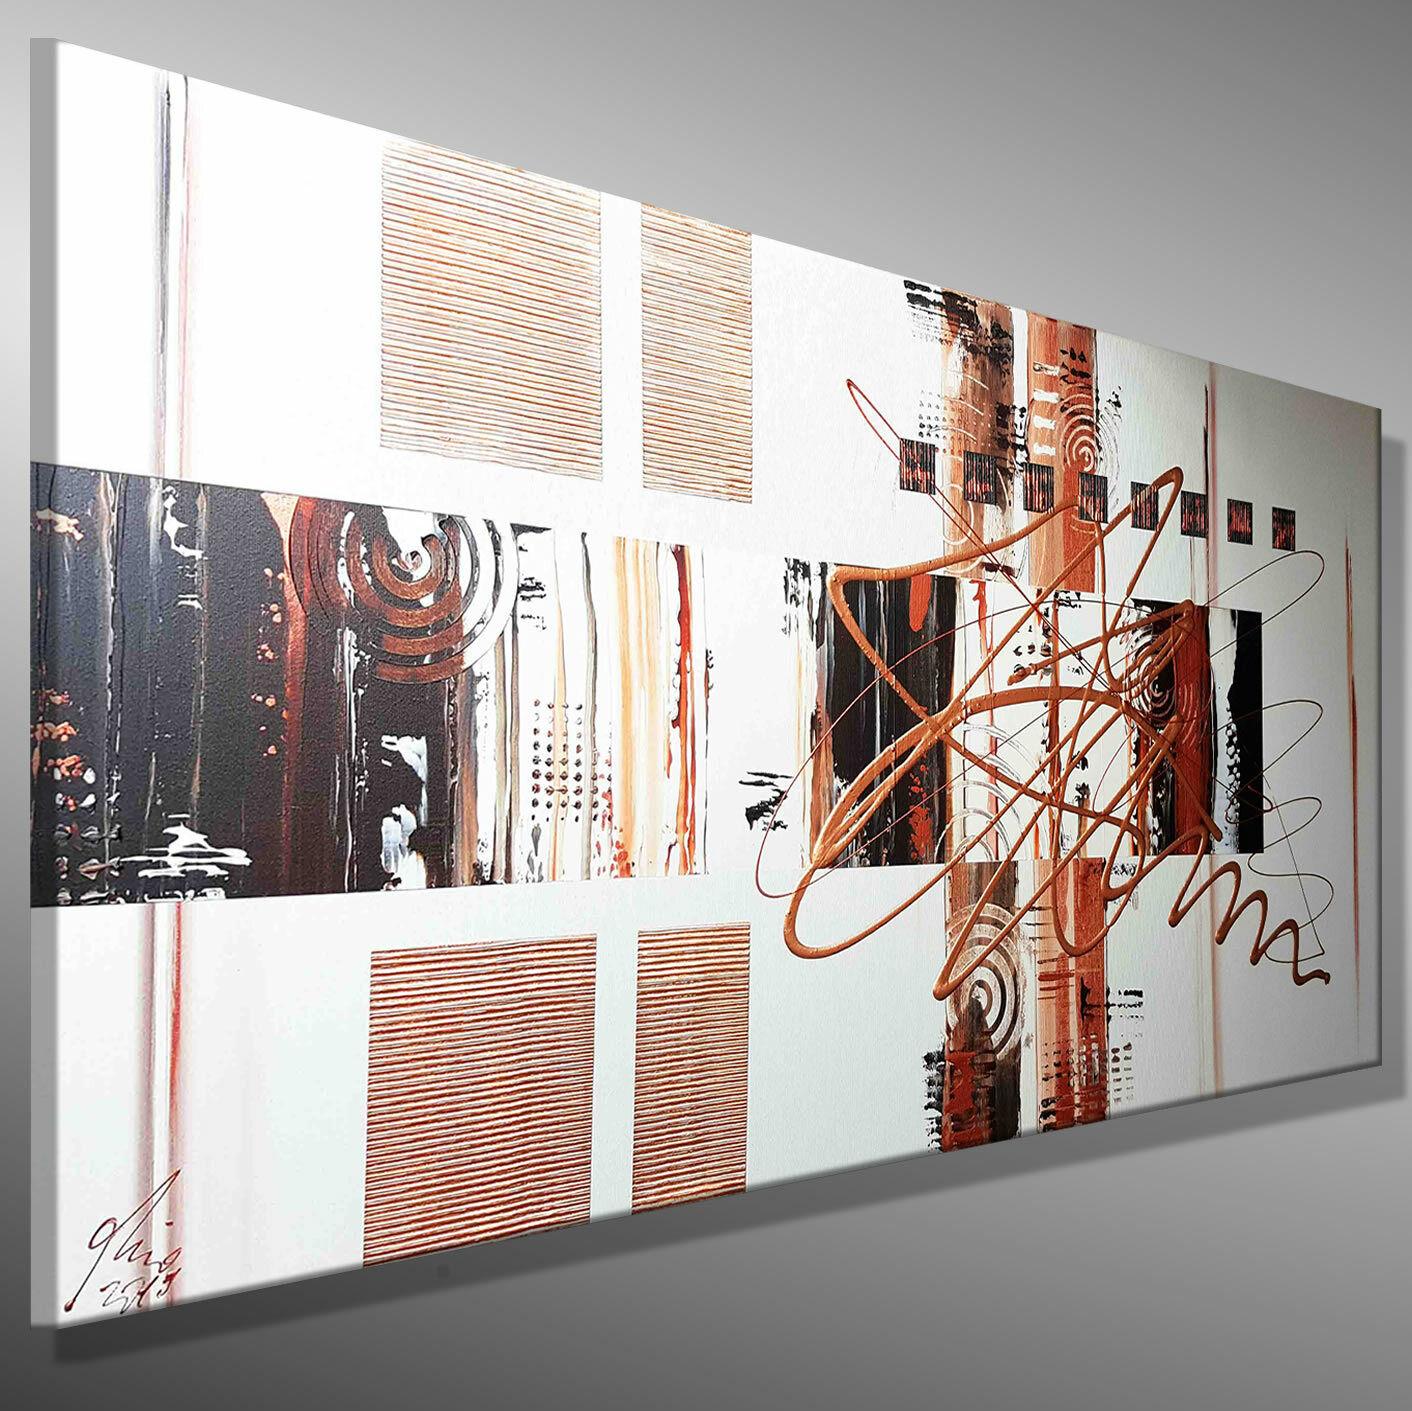 ABSTRAKTE MALEREI WANDBILD Leinwand Moderne KUNST Bilder MICO 120x60 Acrylbild